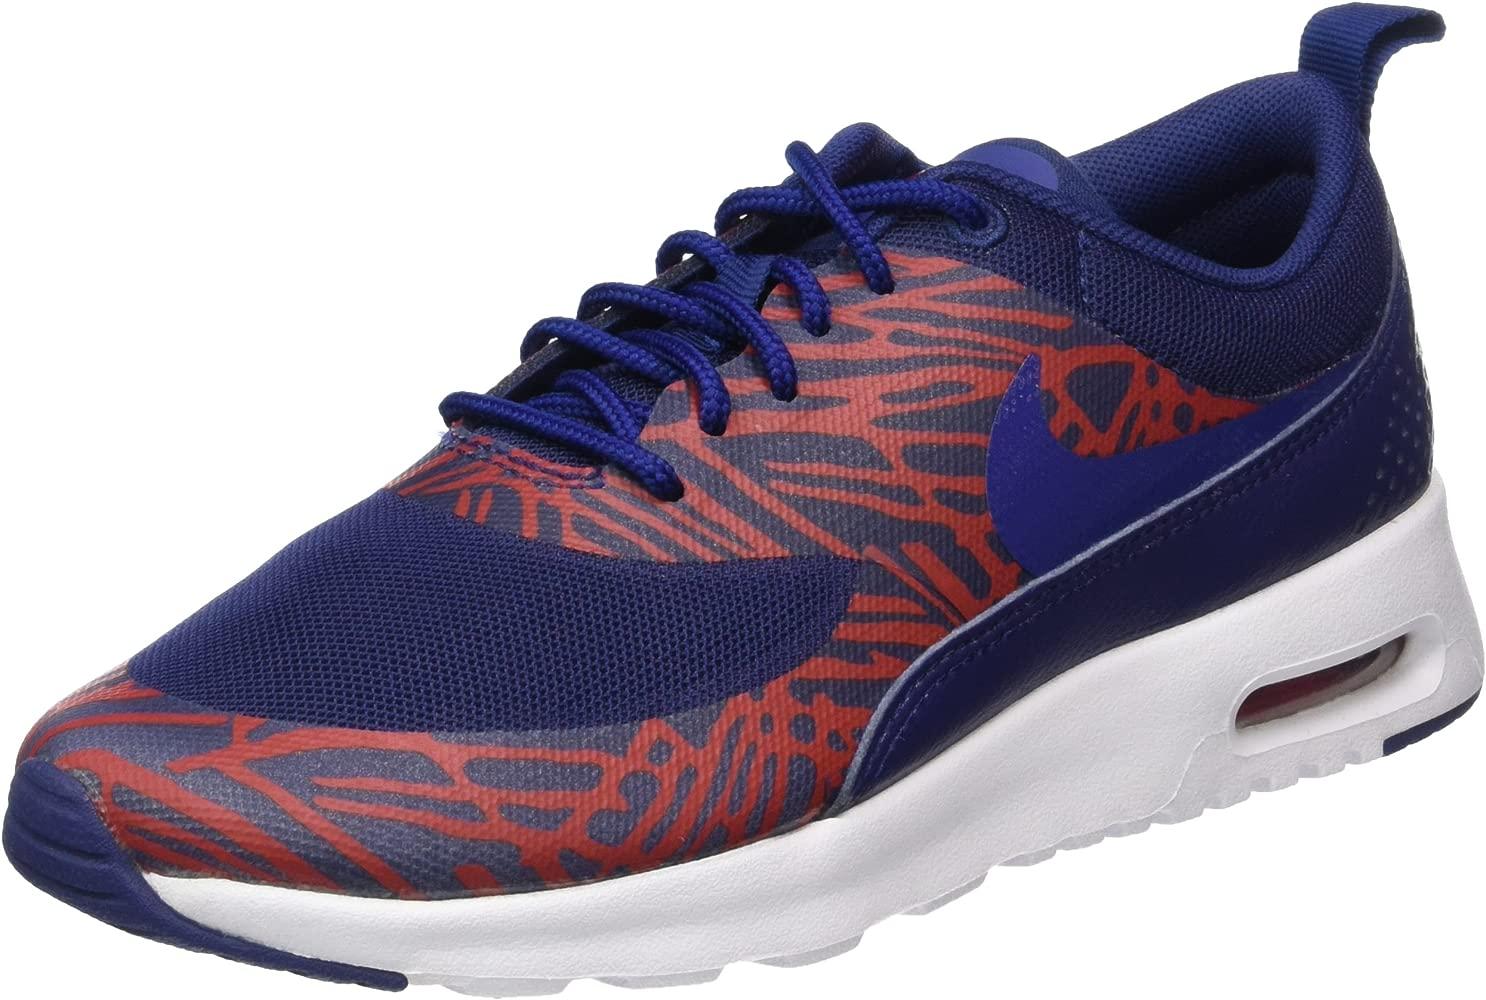 Nike Wmns Air MAX Thea Print, Zapatillas de Deporte para Mujer